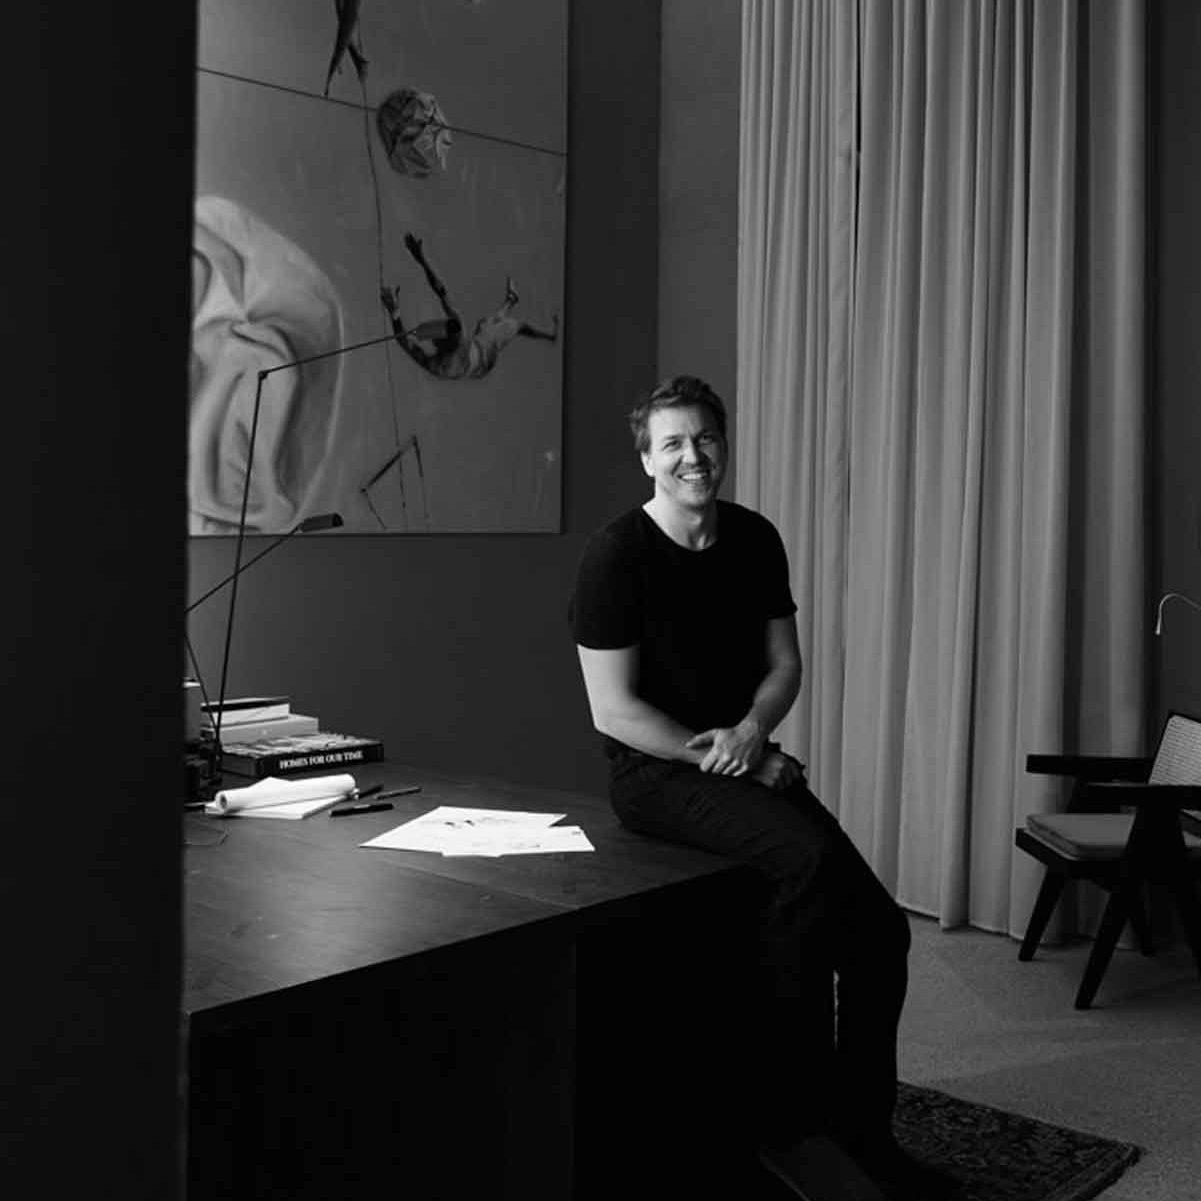 Portraitfoto von Michael Karasek, Architekt Baukooperative